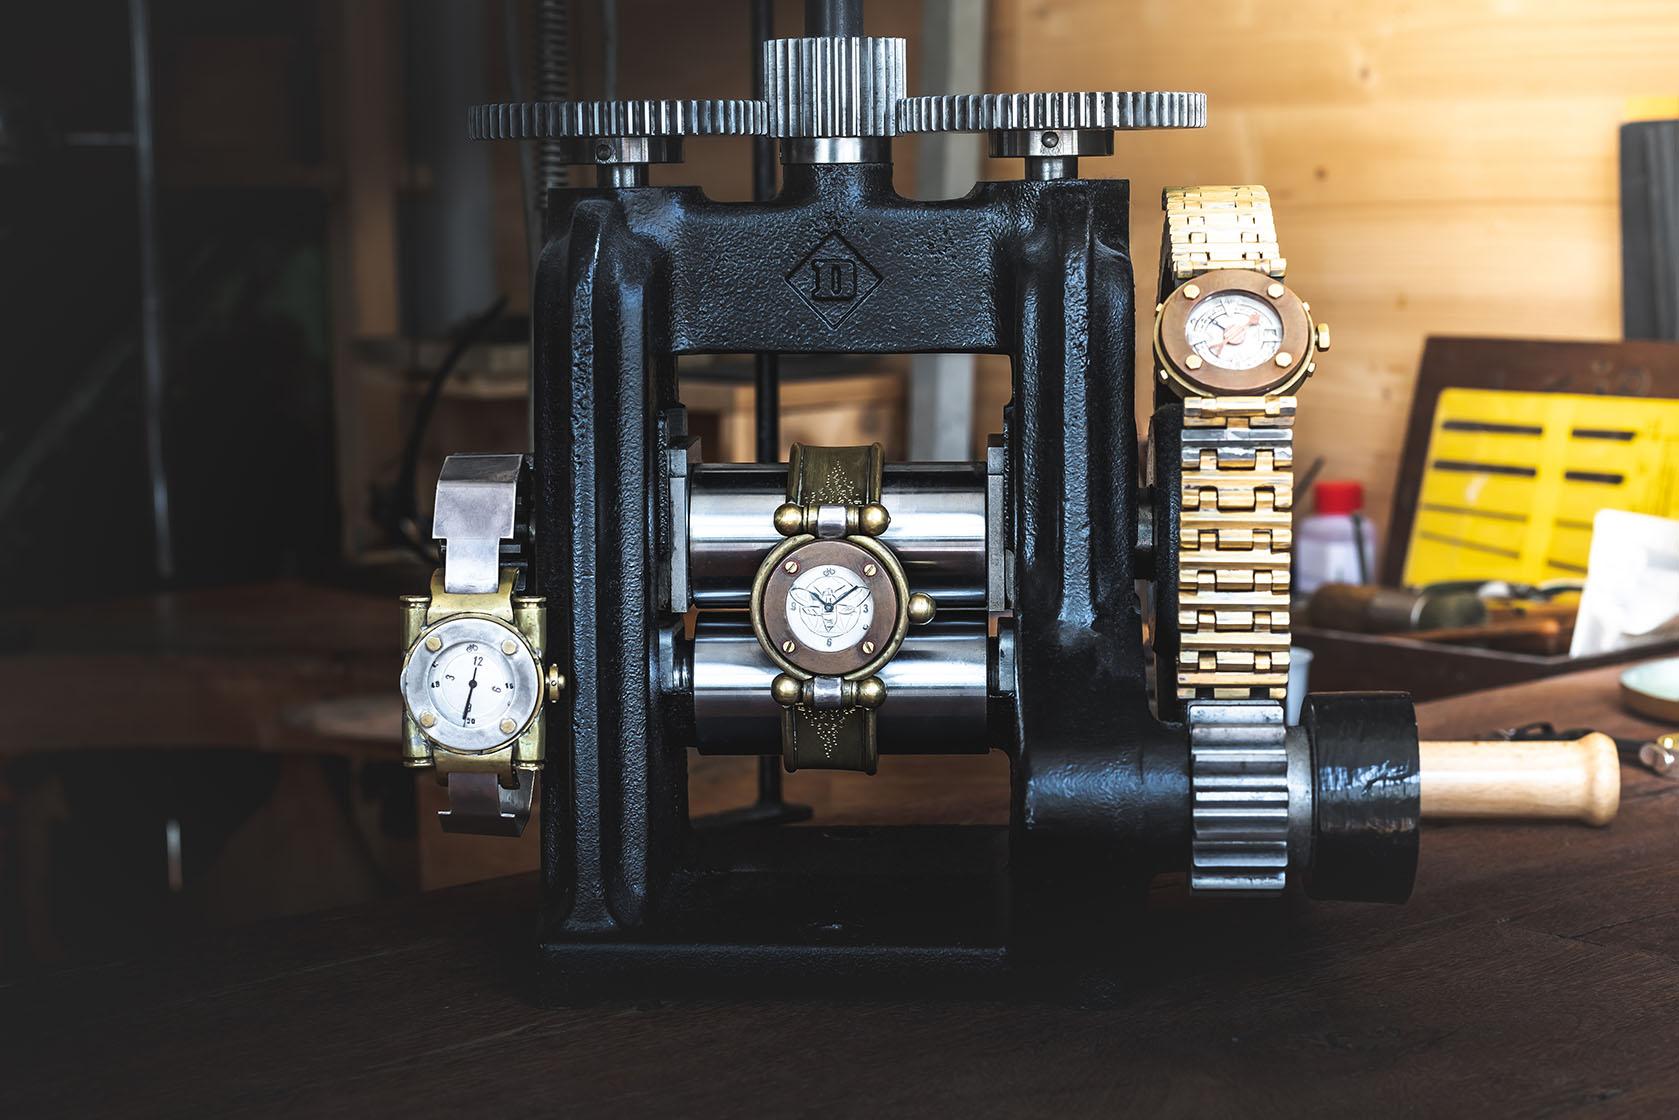 Armbanduhren Einzelstück - Atelier Horloges - Jochen Leopold